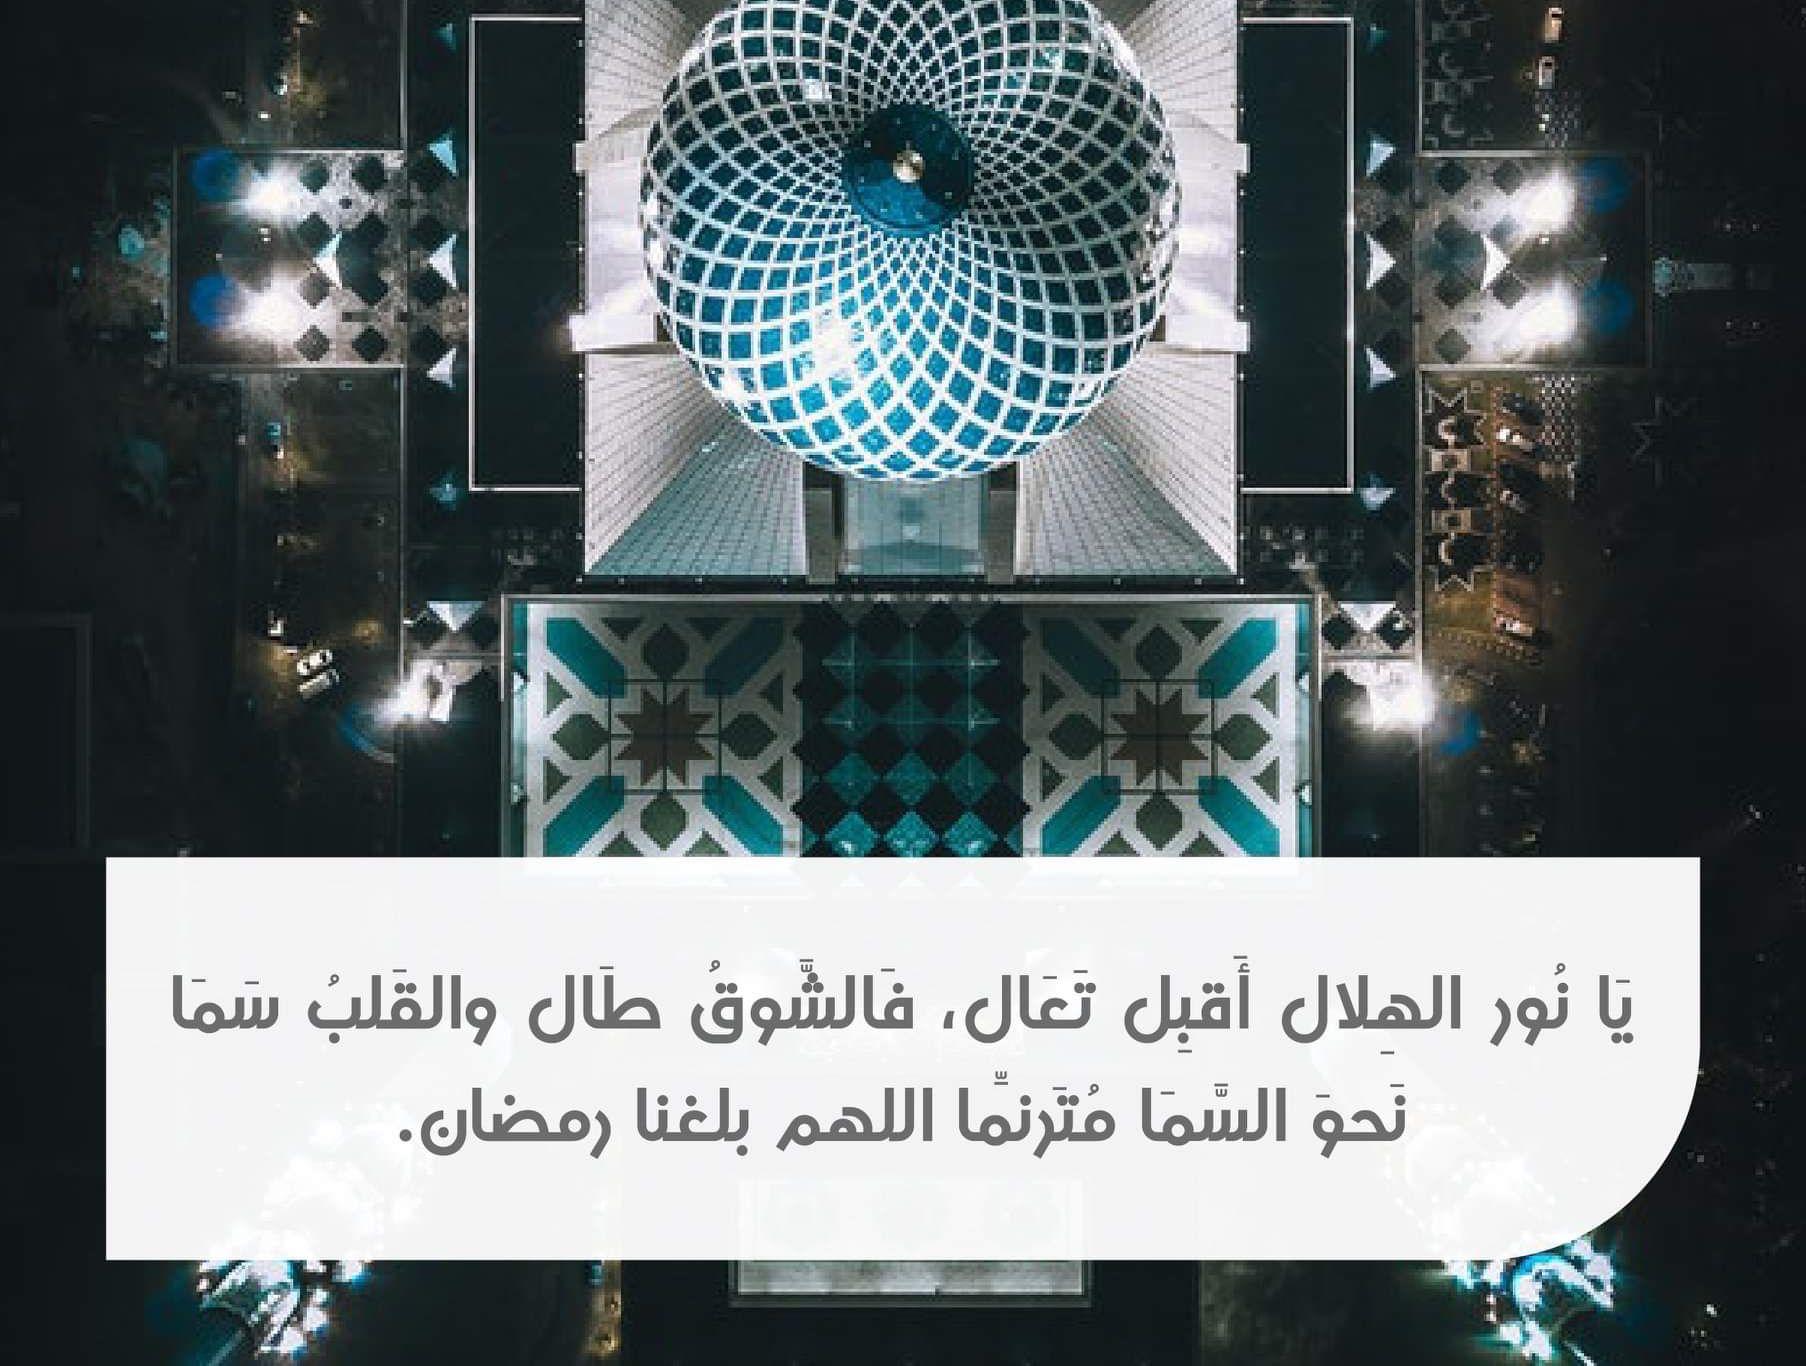 Pin By صورة و كلمة On رمضان كريم Ramadan Kareem Table Fan Home Appliances Occasion